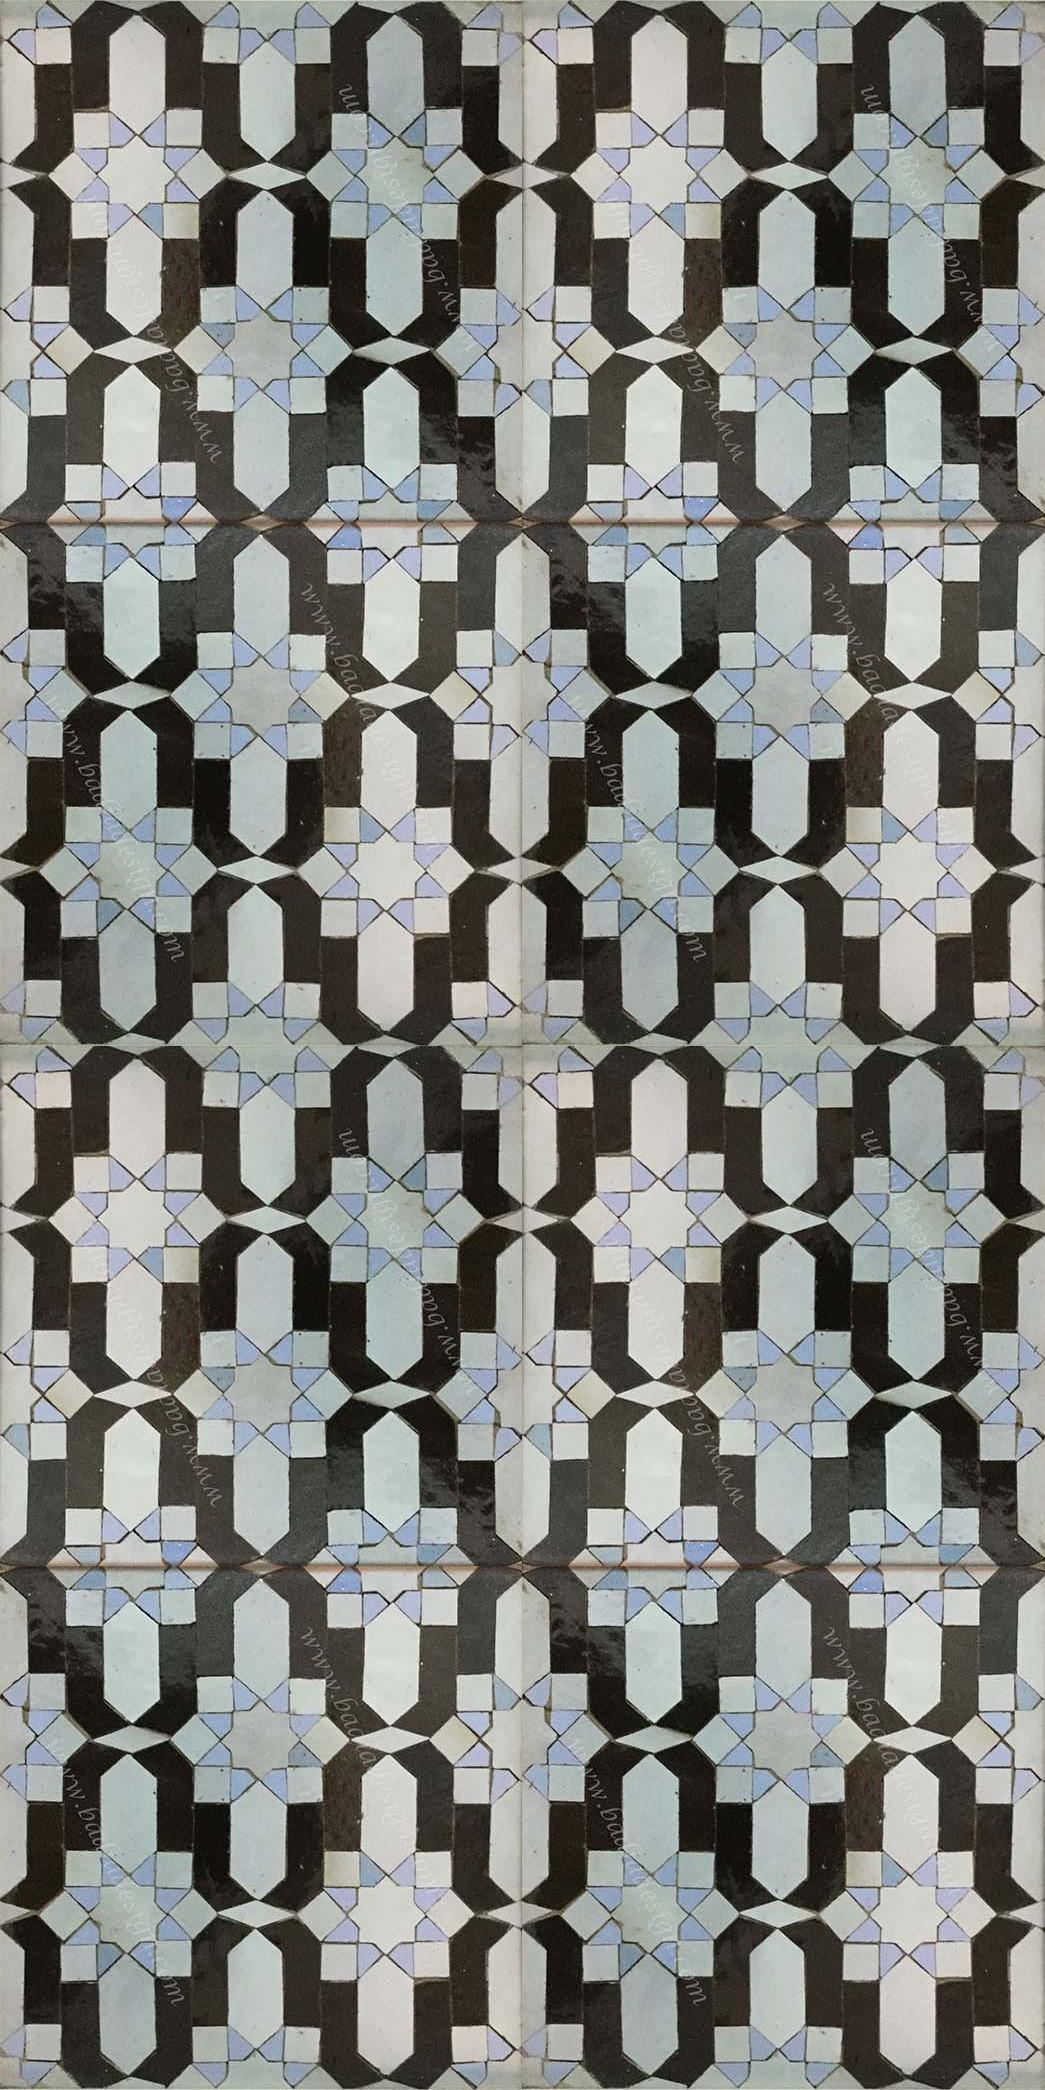 moroccan-mosaic-floor-tile-tm054-2a.jpg